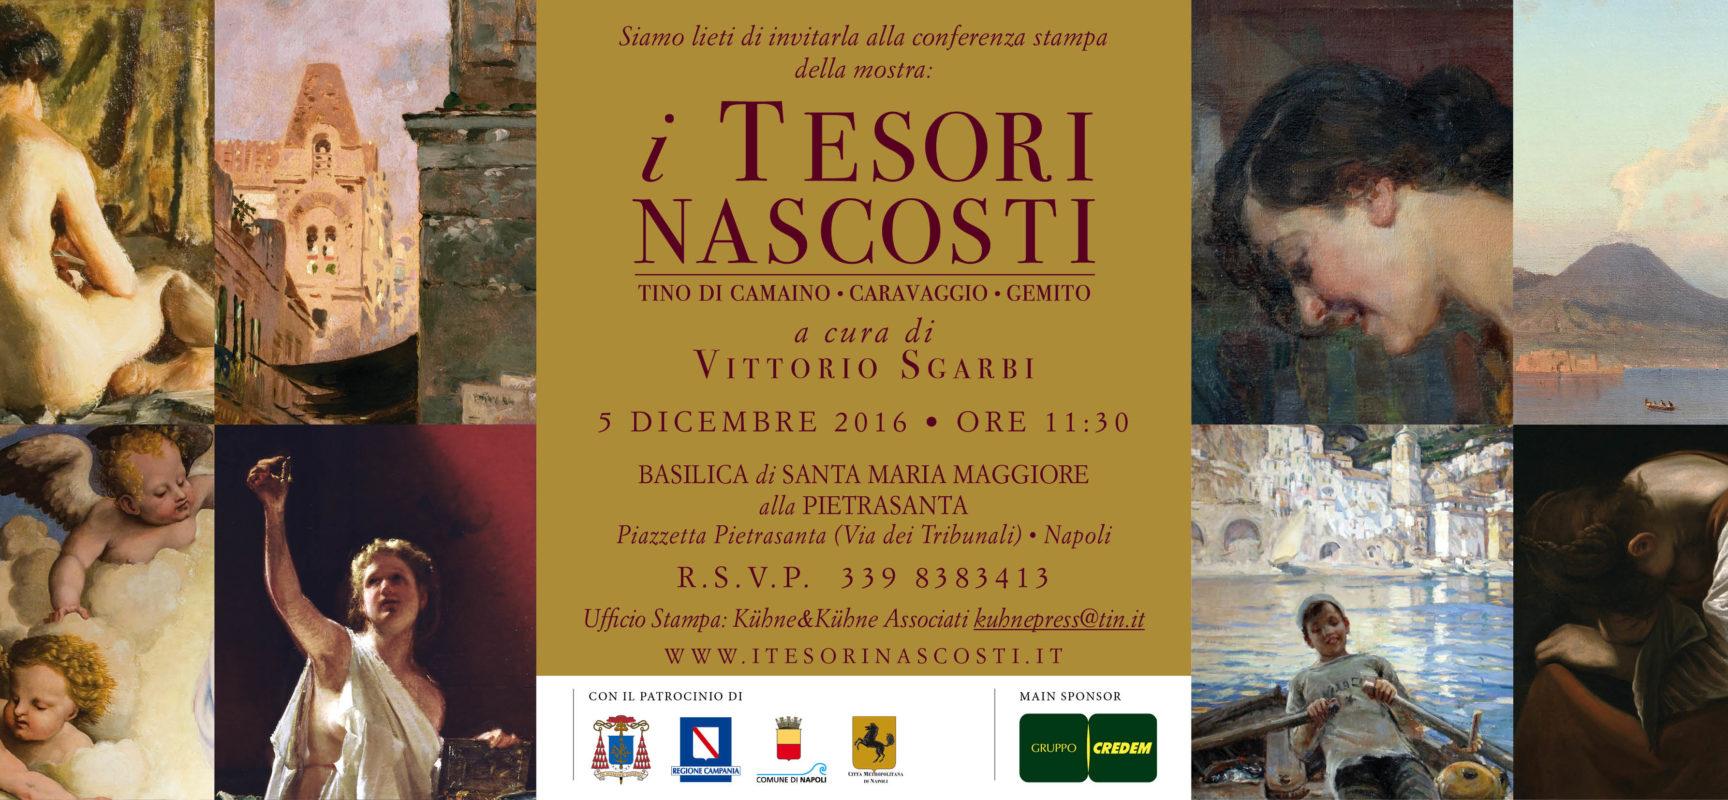 Vittorio Sgarbi riapre Pietrasanta con Tesori nascosti